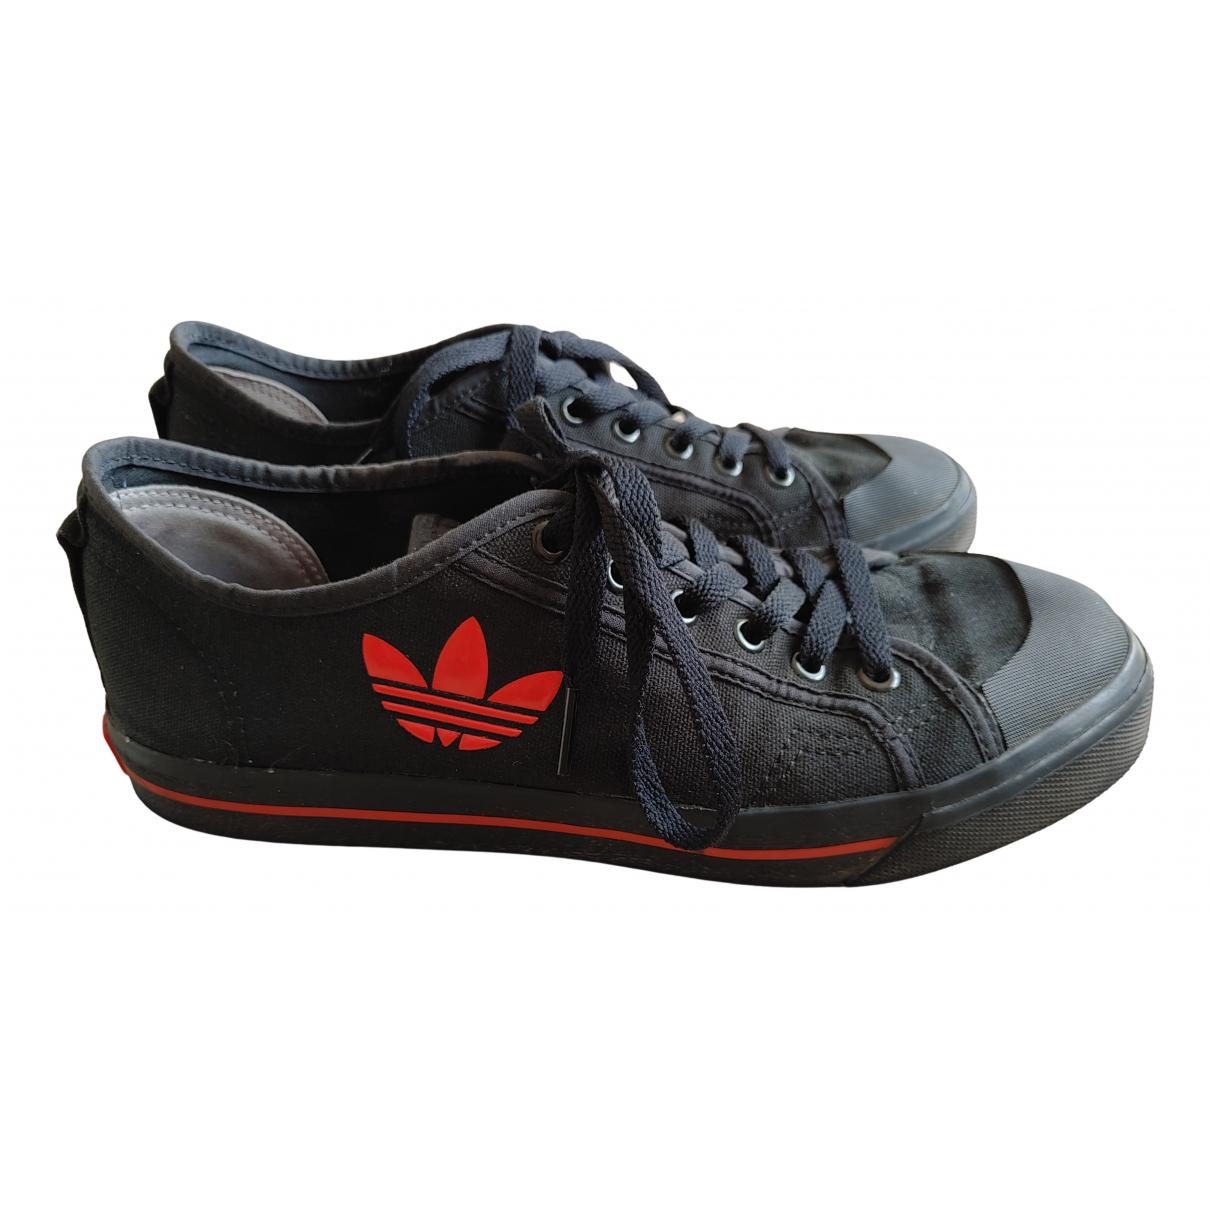 Adidas X Raf Simons Spirit Sneakers in  Schwarz Leinen